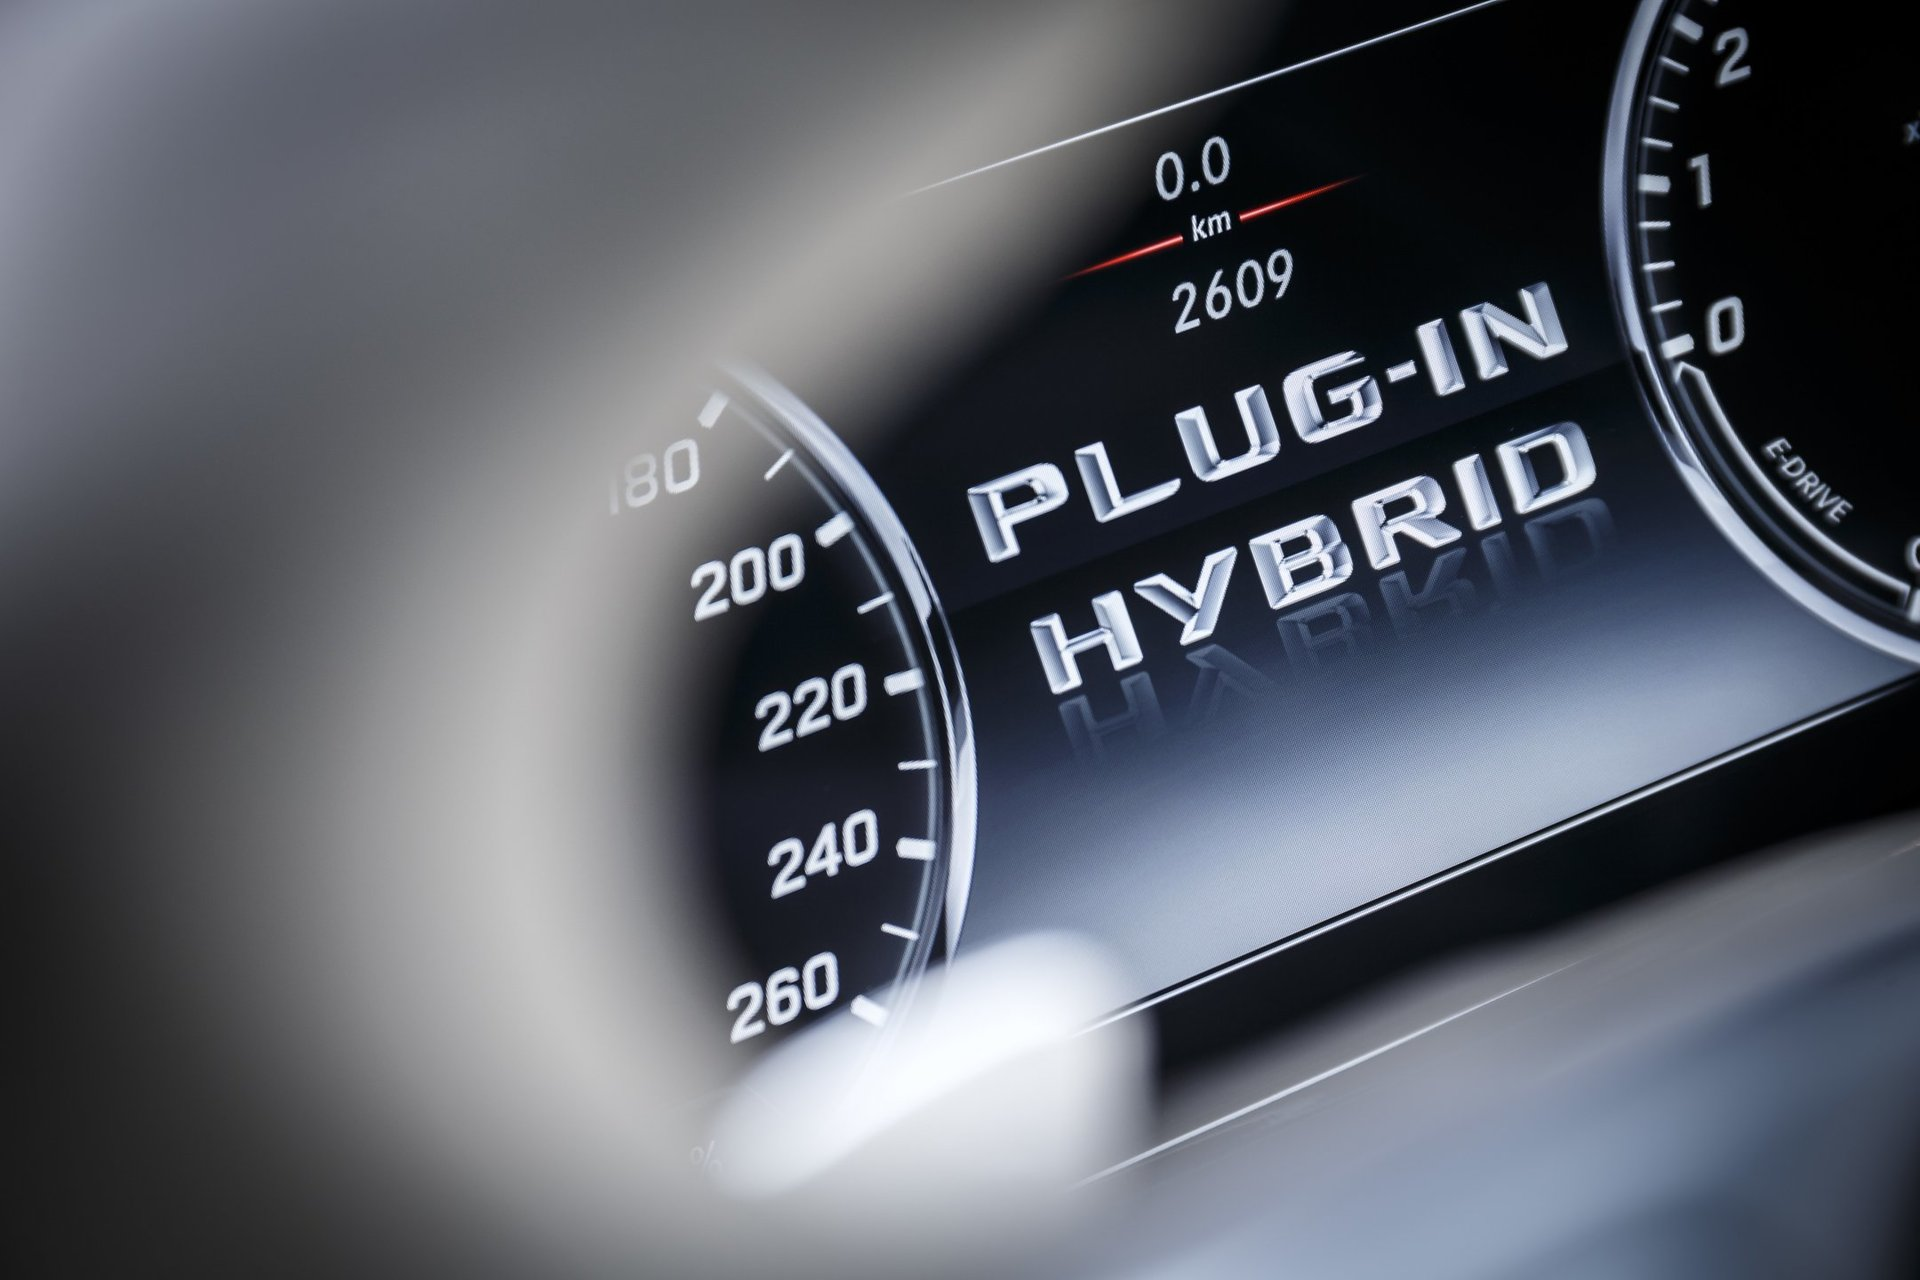 Mercedes-Benz S 500 Plug-in Hybrid (2014)